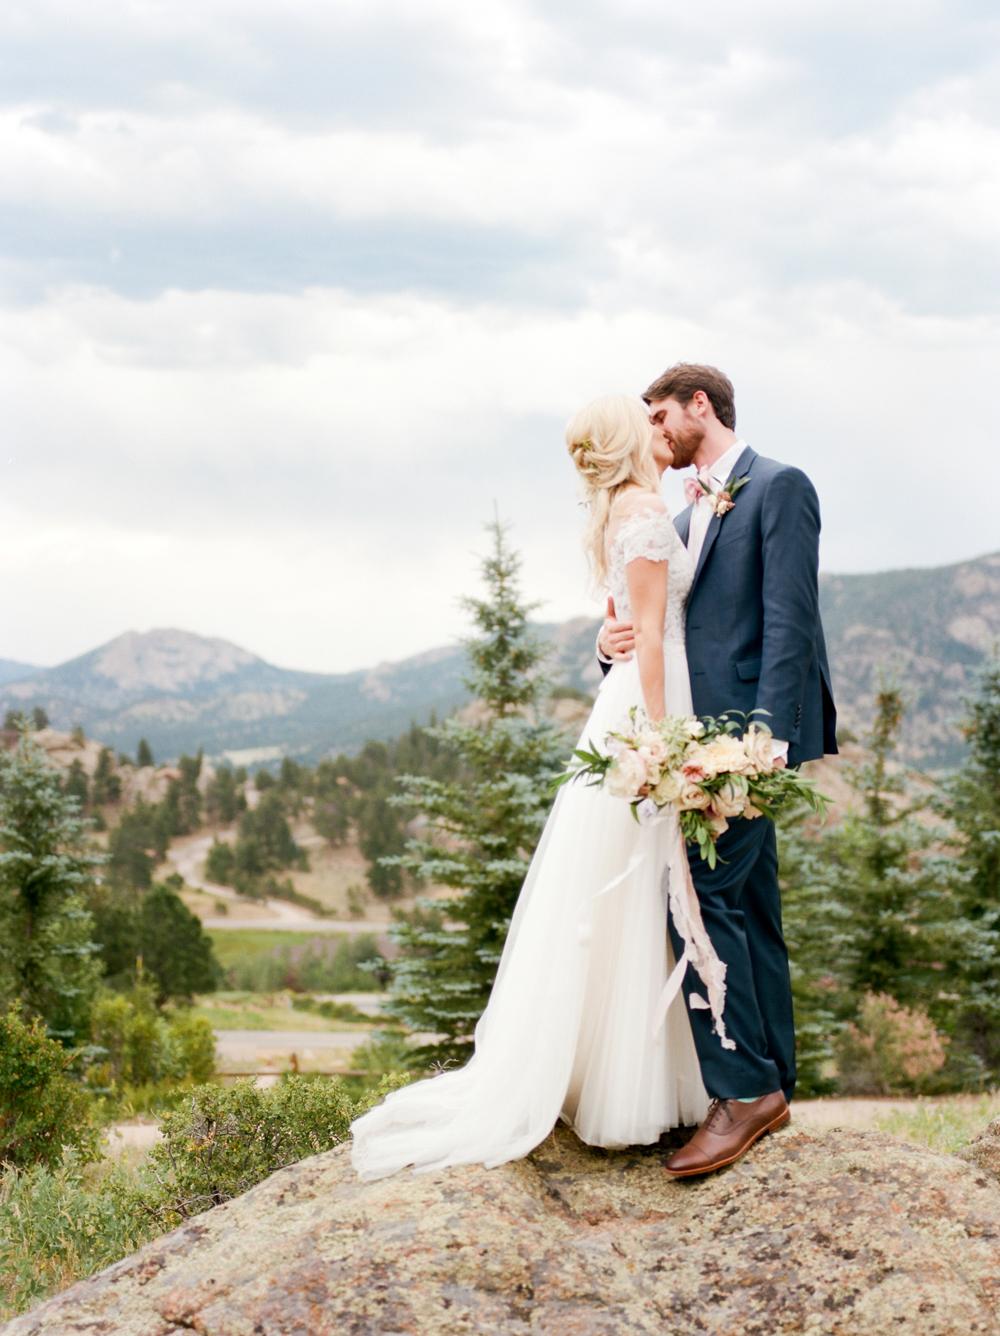 Bostick-Durham-Wedding-495.jpg